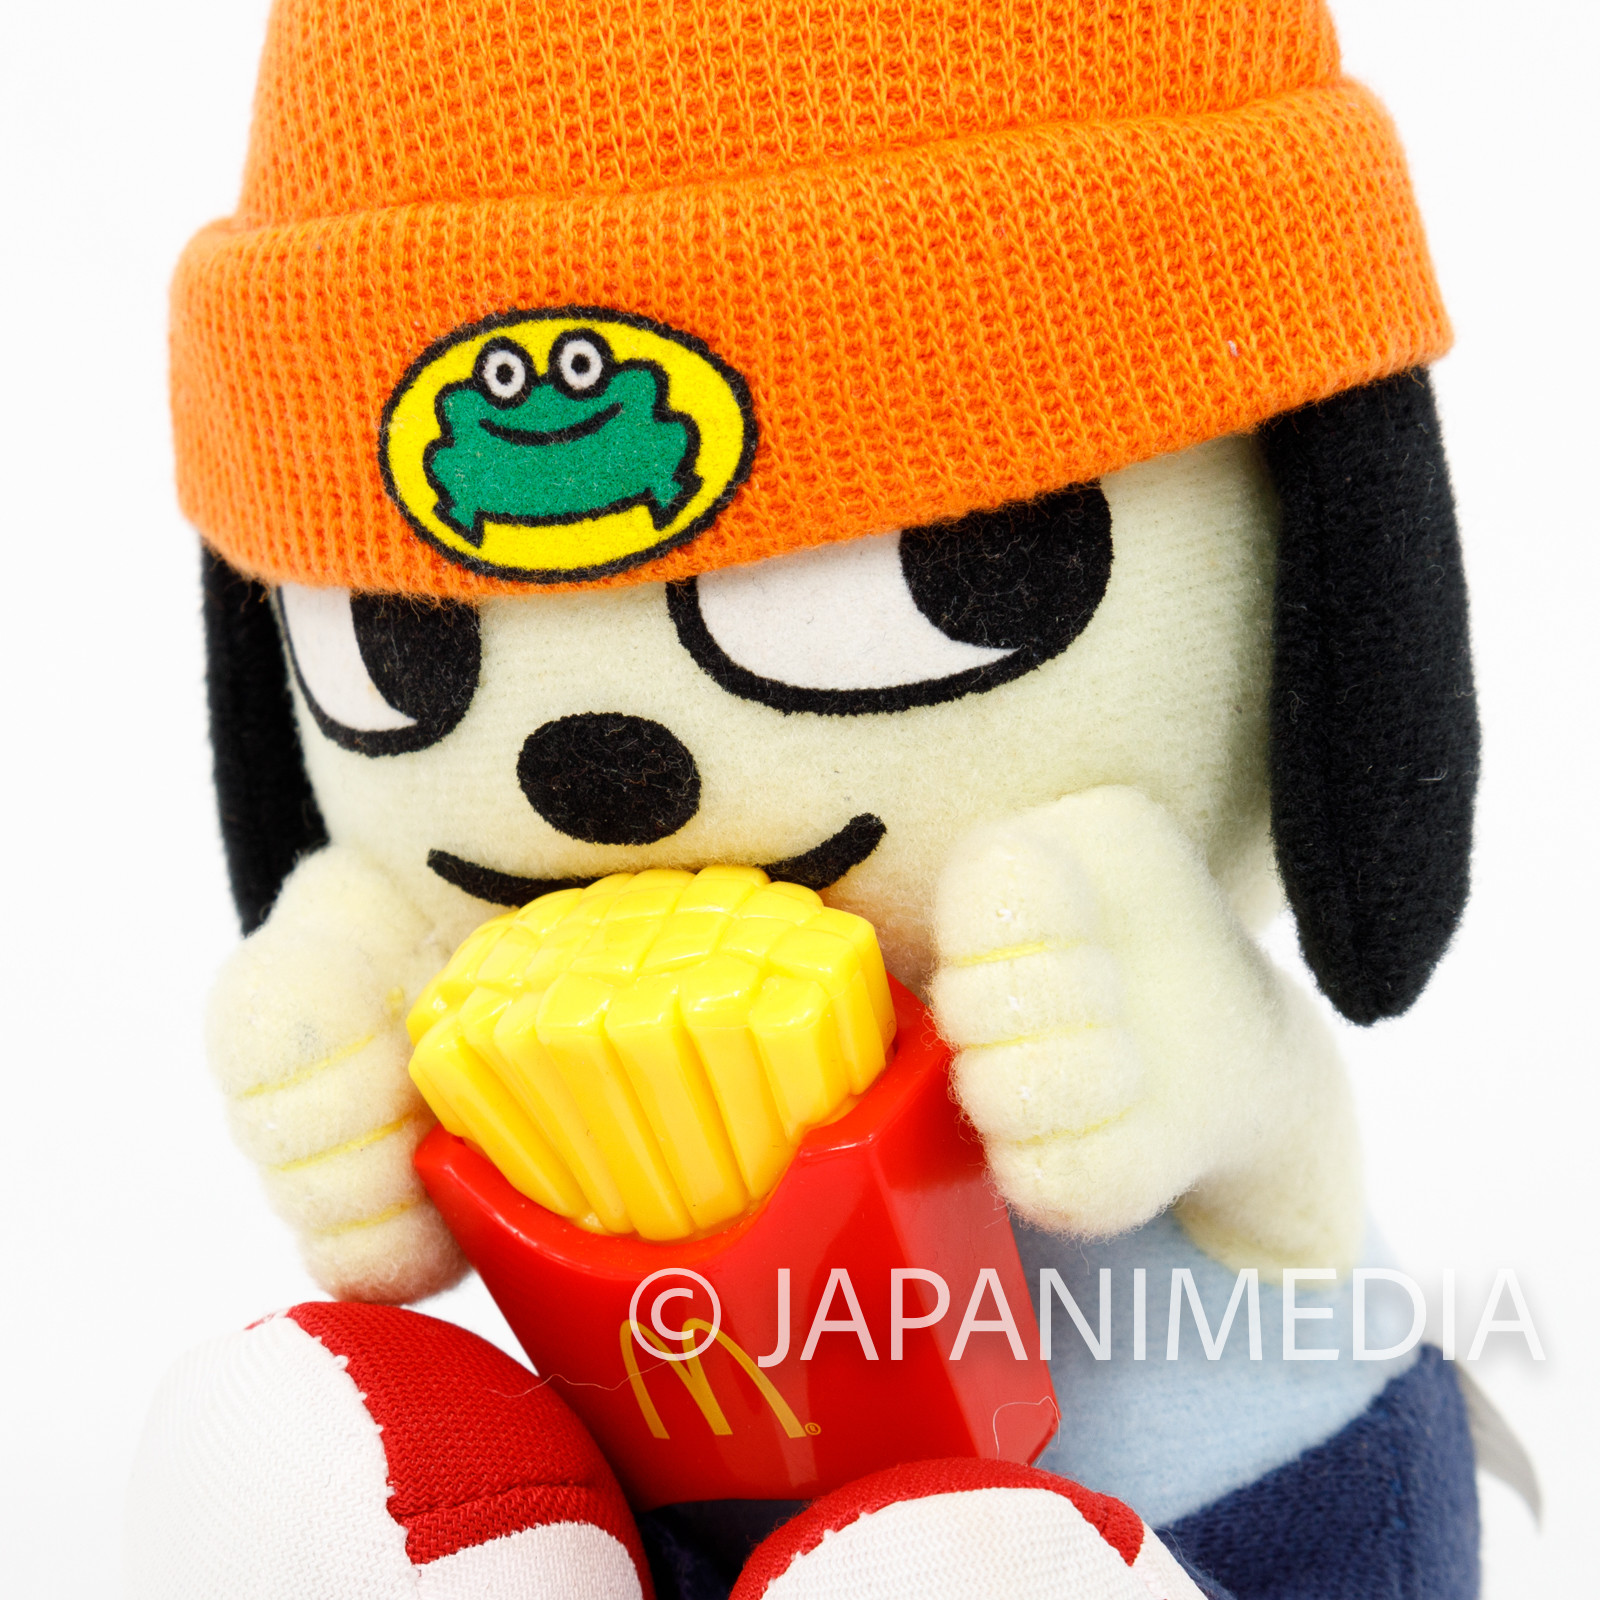 RARE! Parappa The Rapper Parappa Shaking Plush Doll Figure Macdonald Potatoes